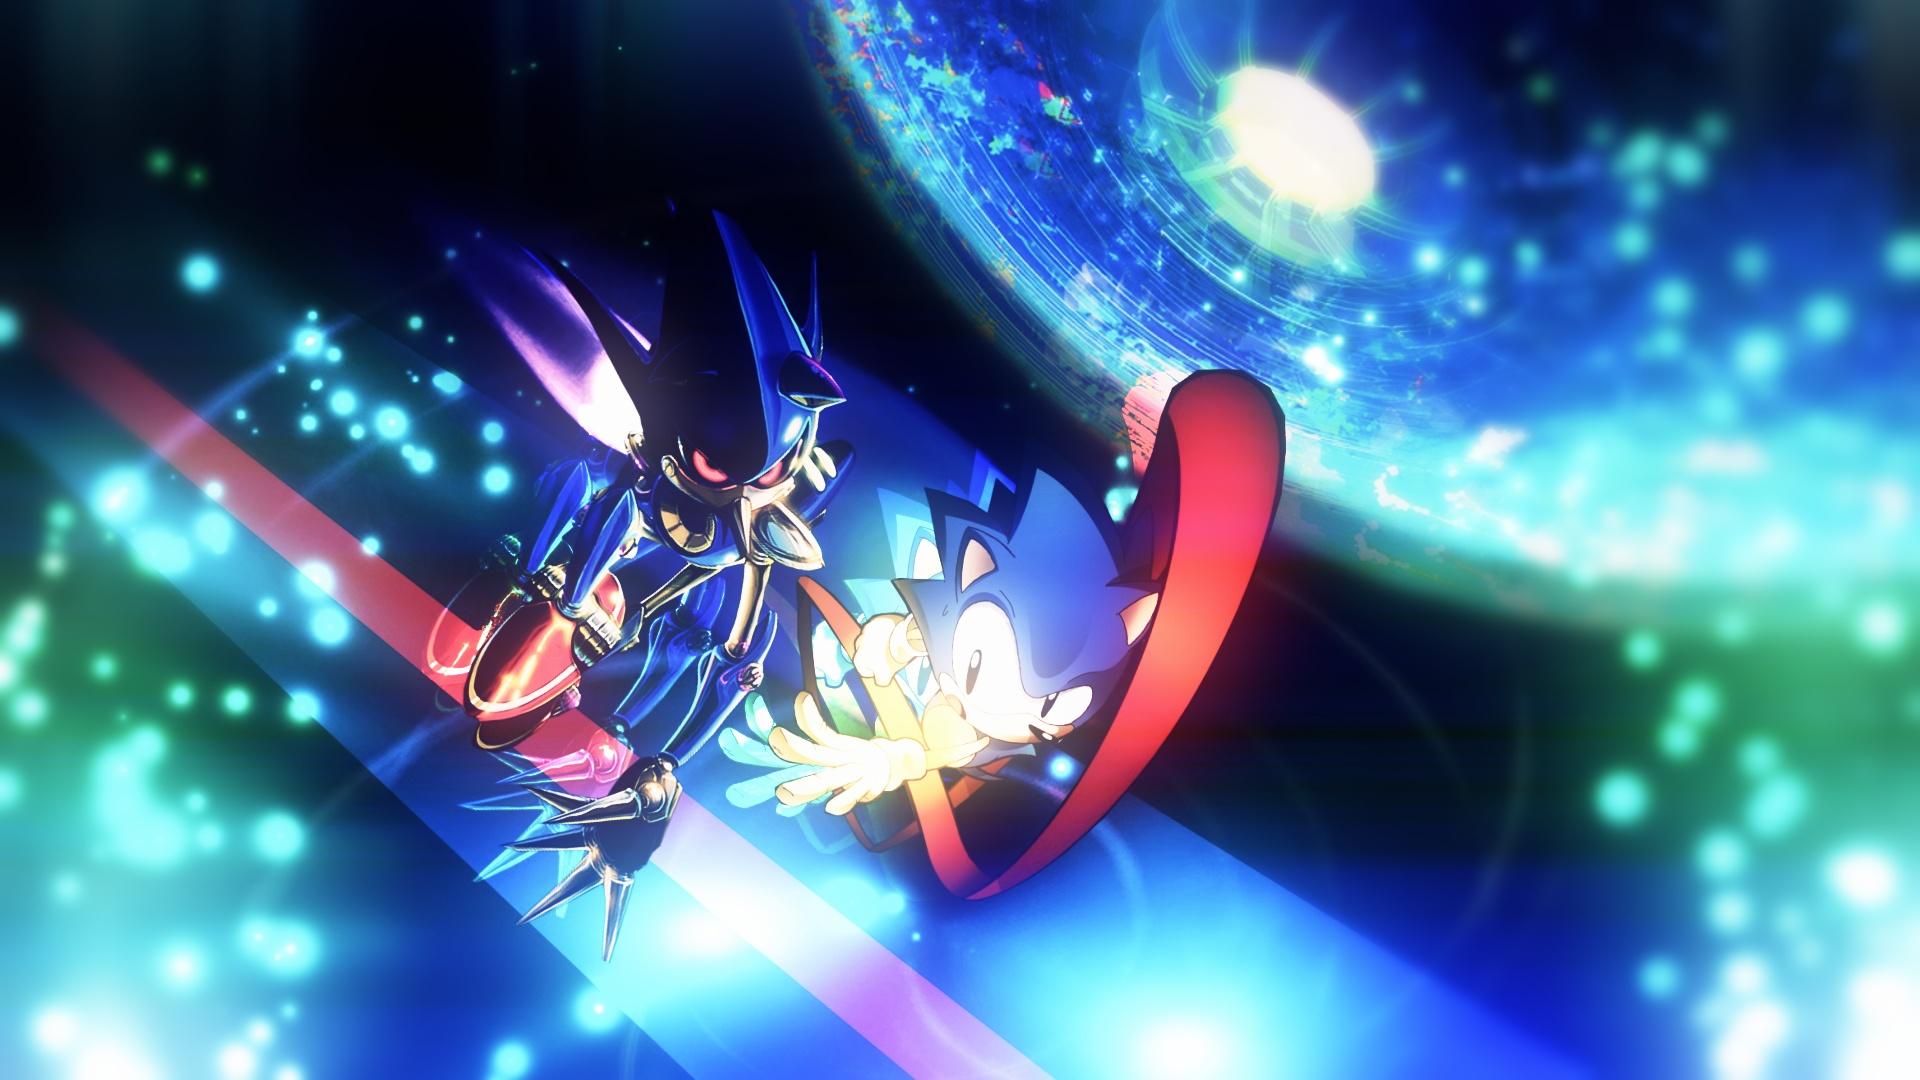 Sonic CD HD Wallpaper